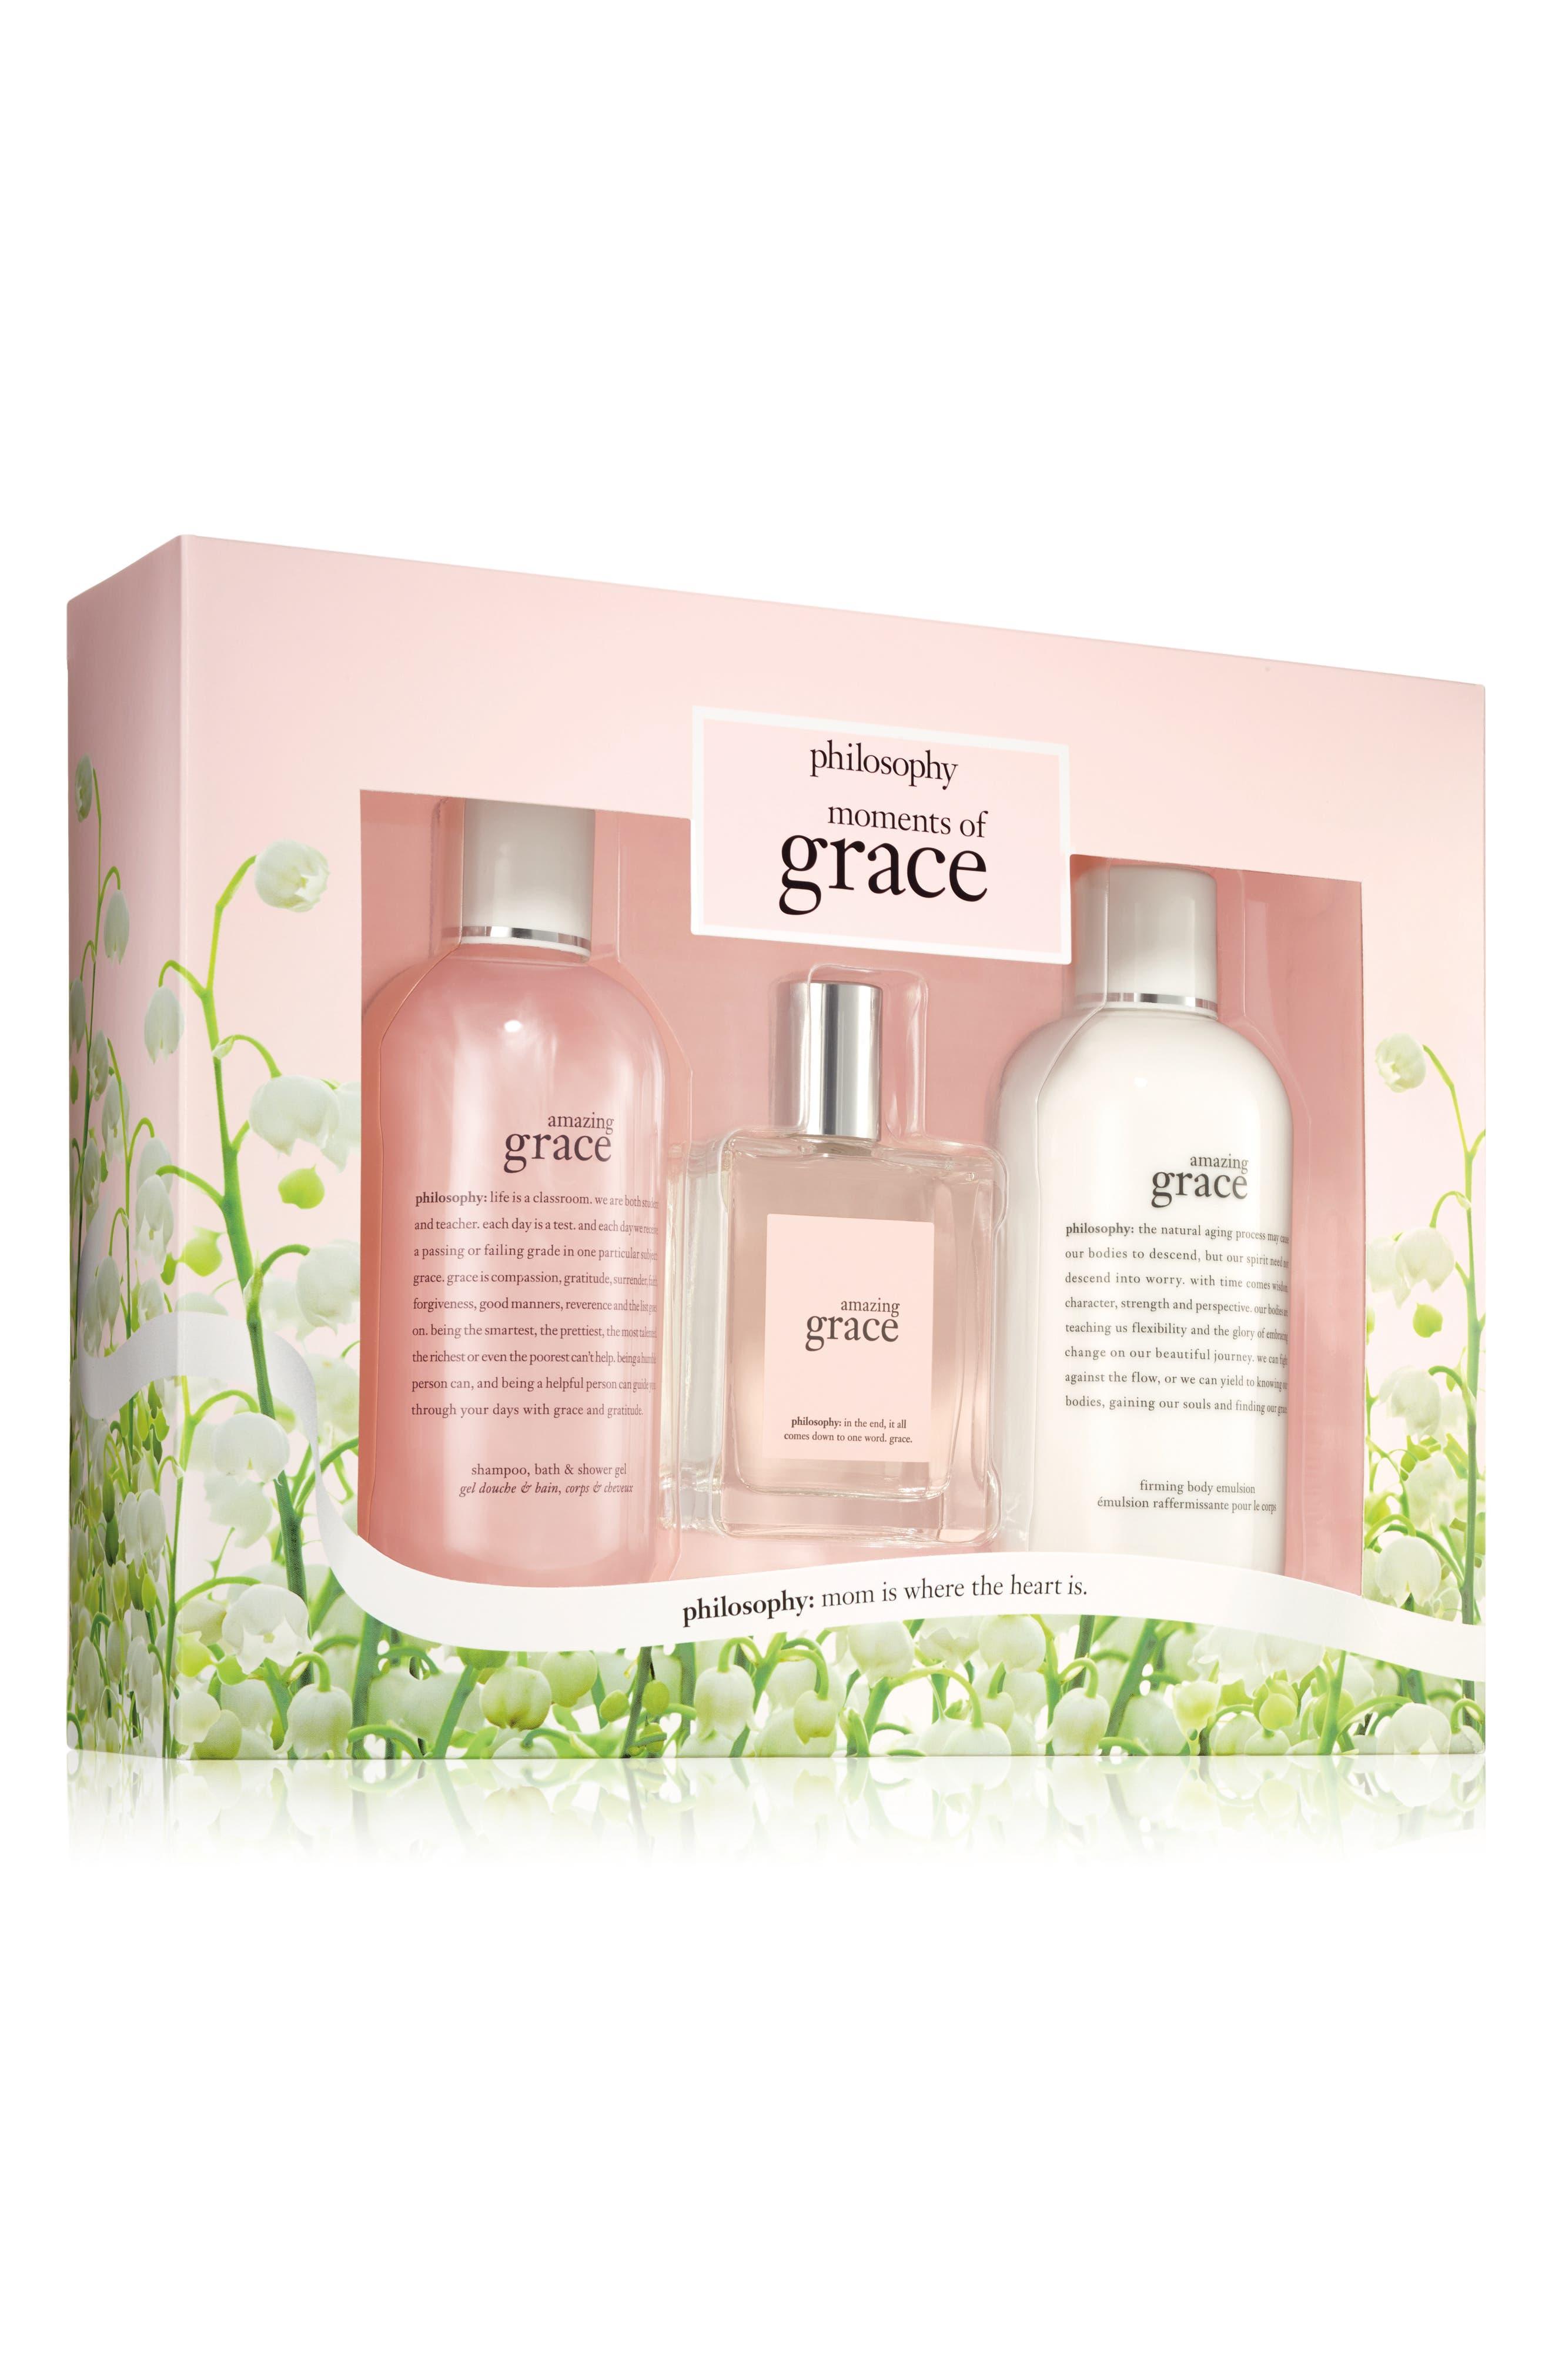 philosophy amazing grace set ($88 Value)